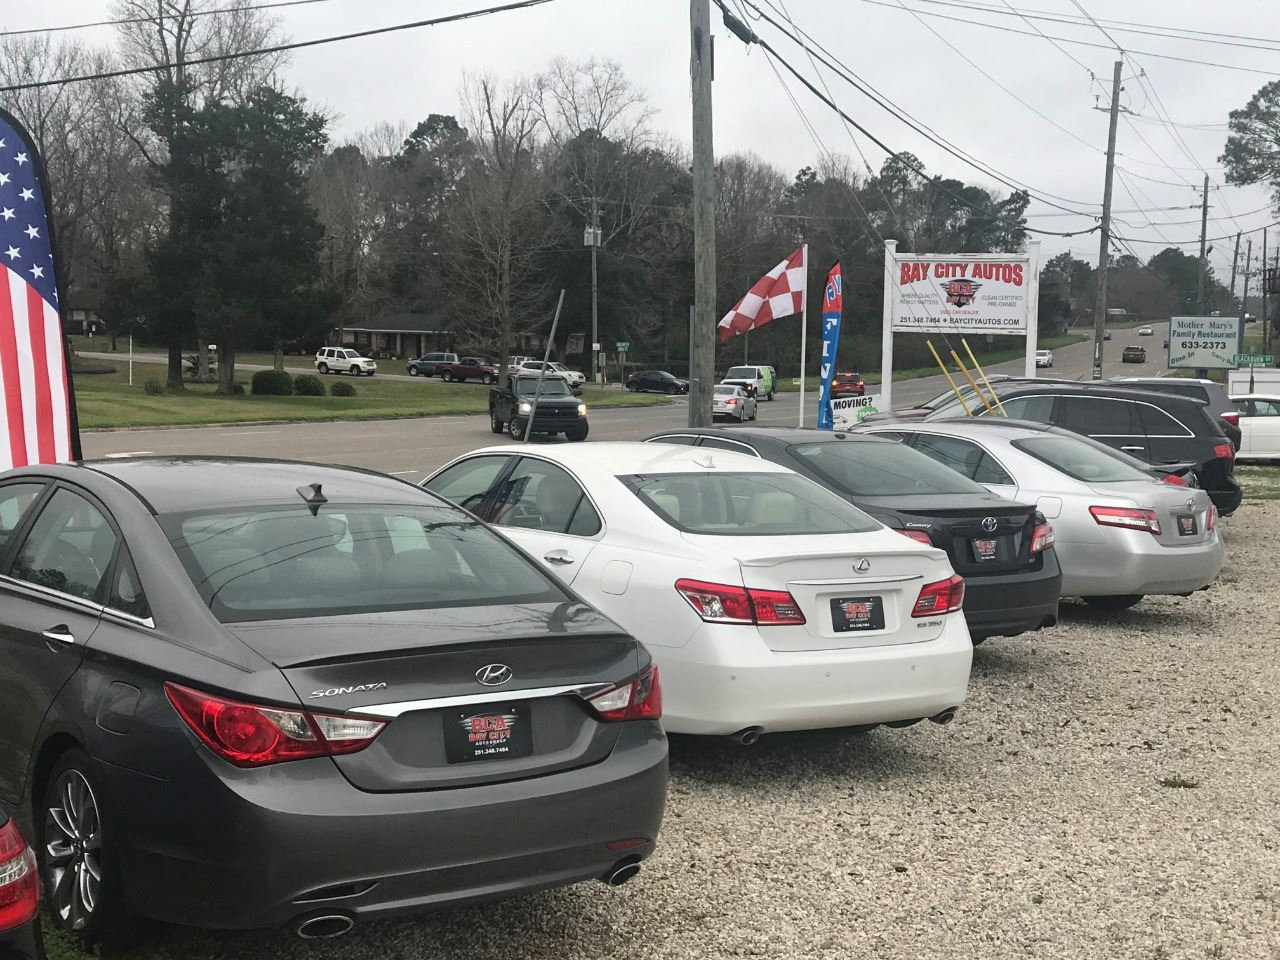 Bay City Auto's